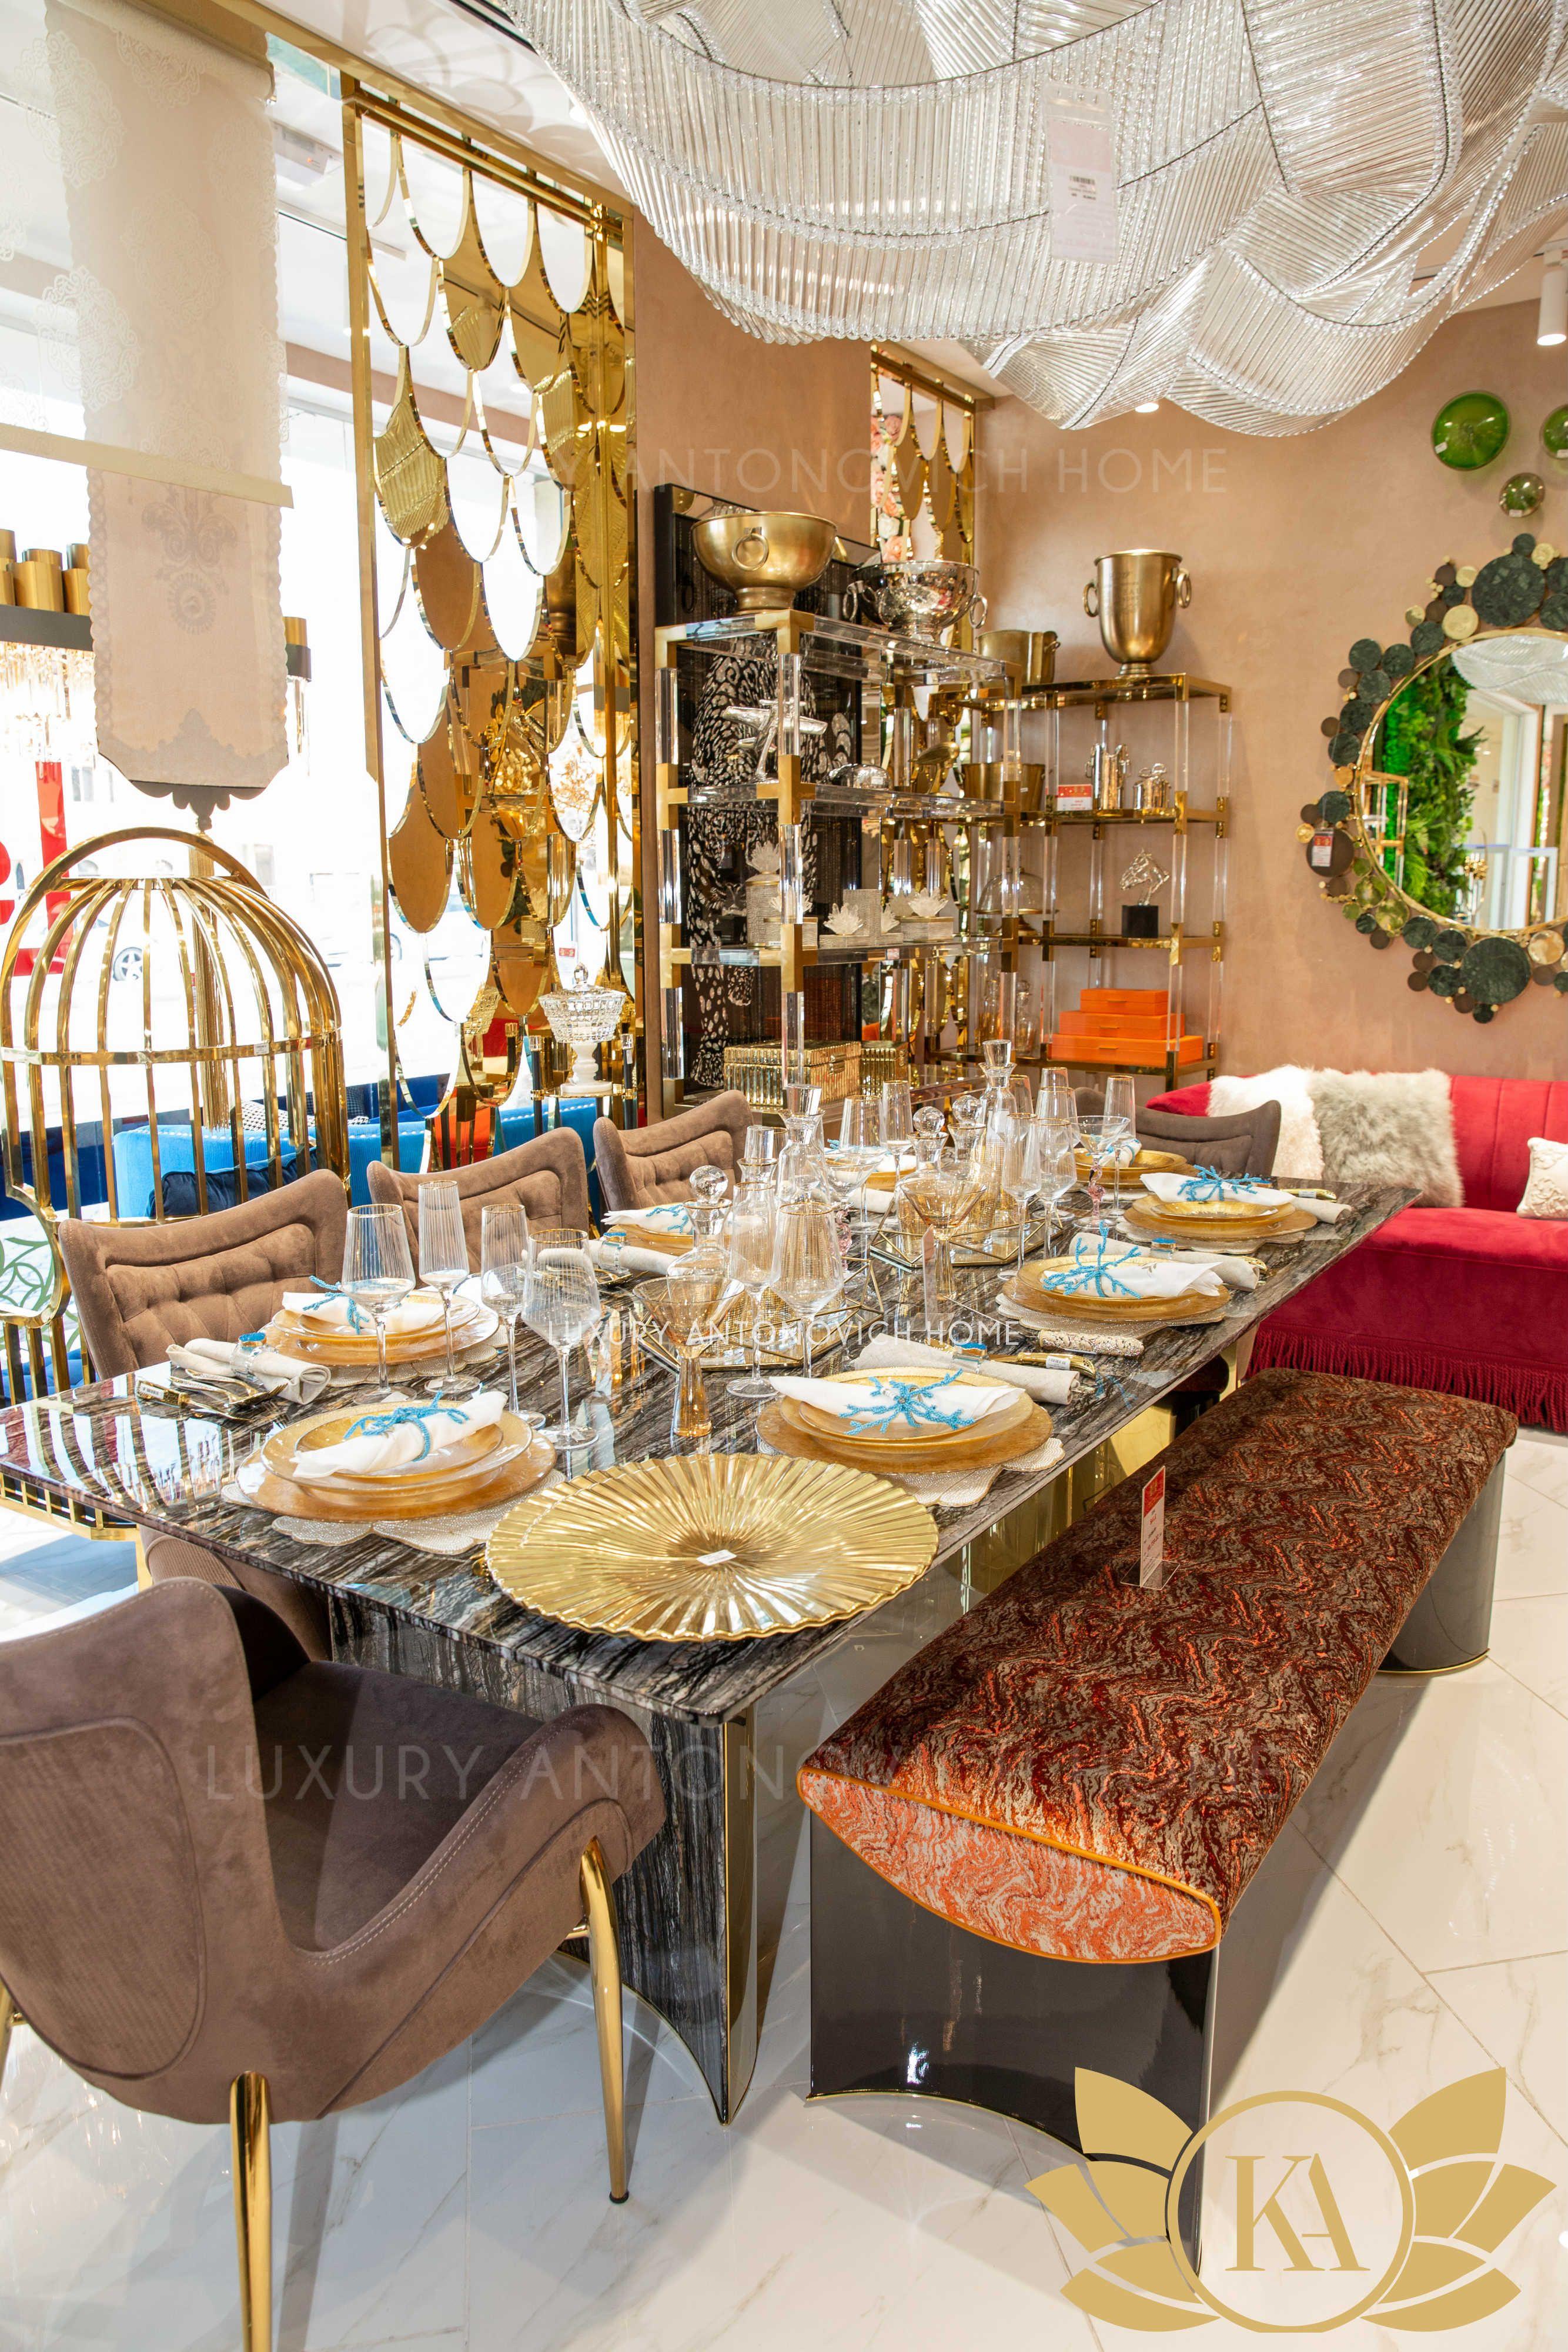 Best Italian Furniture Dubai Italian Dining Tables Collection In 2020 Italian Dining Table Dining Room Design Modern Dining